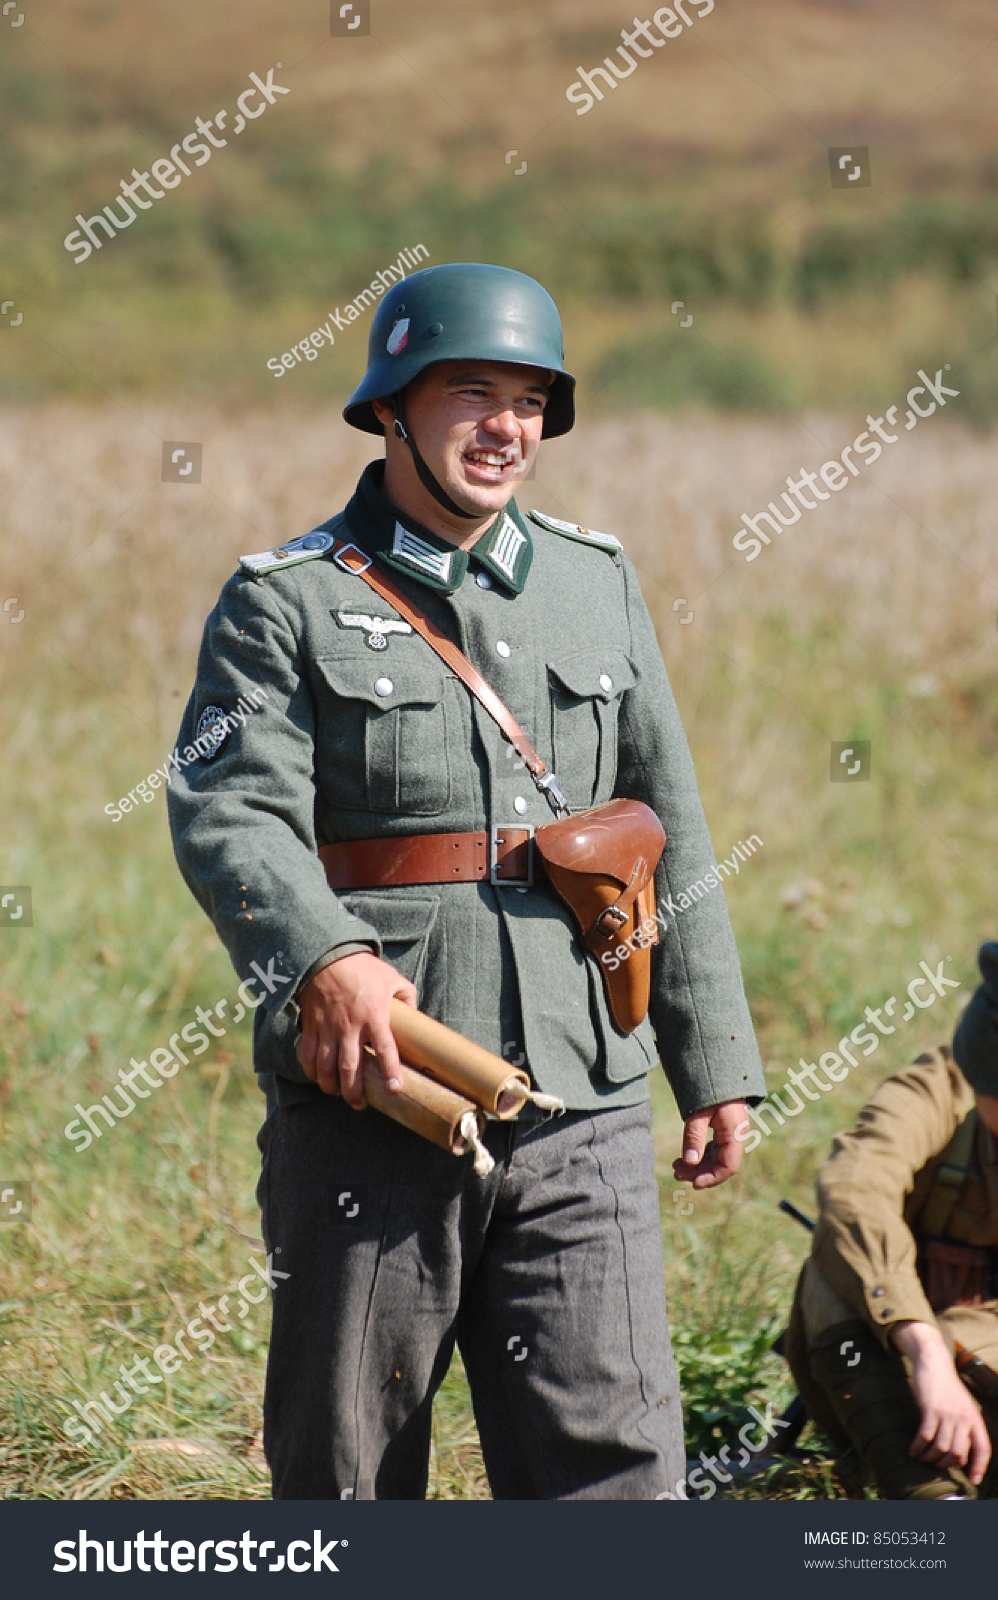 German Soldier Ww2 Reenactment Kievukraine Stock Photo ...